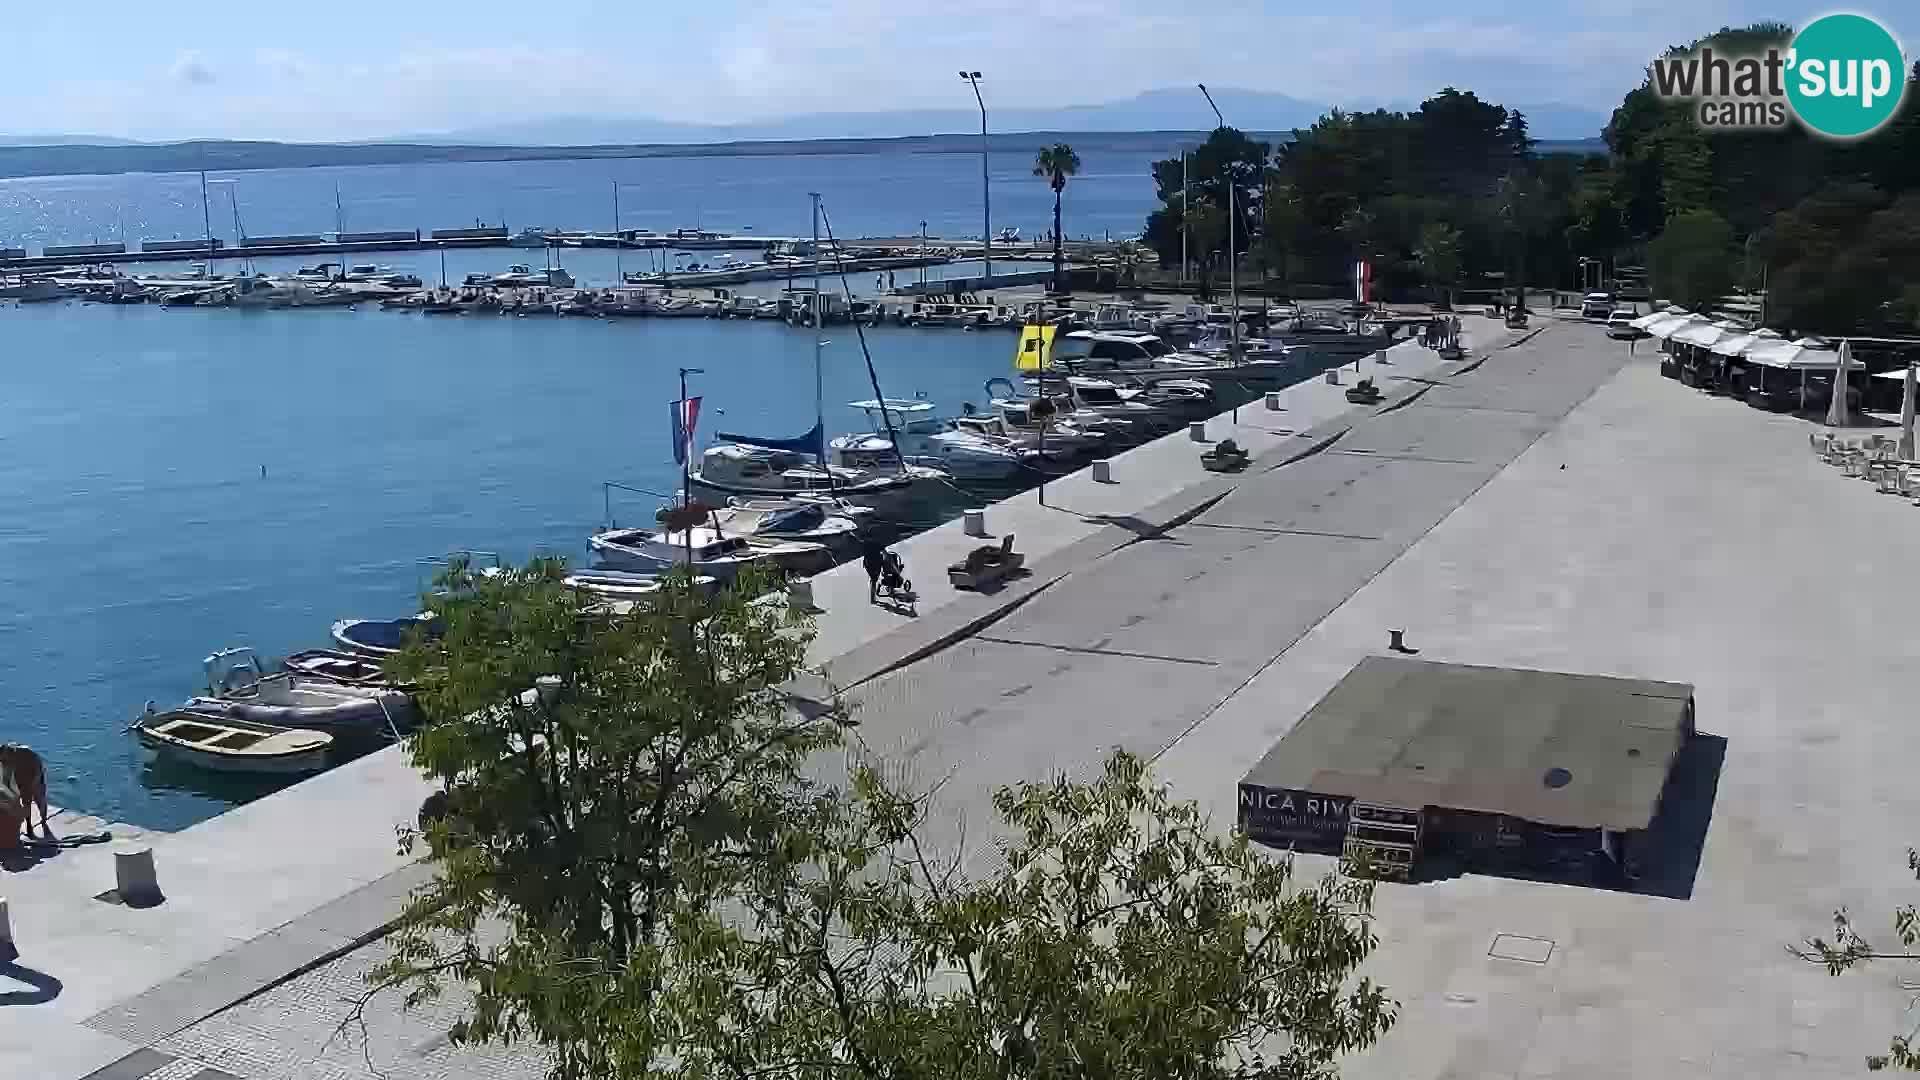 Crikvenica – Trg Stjepan Radić